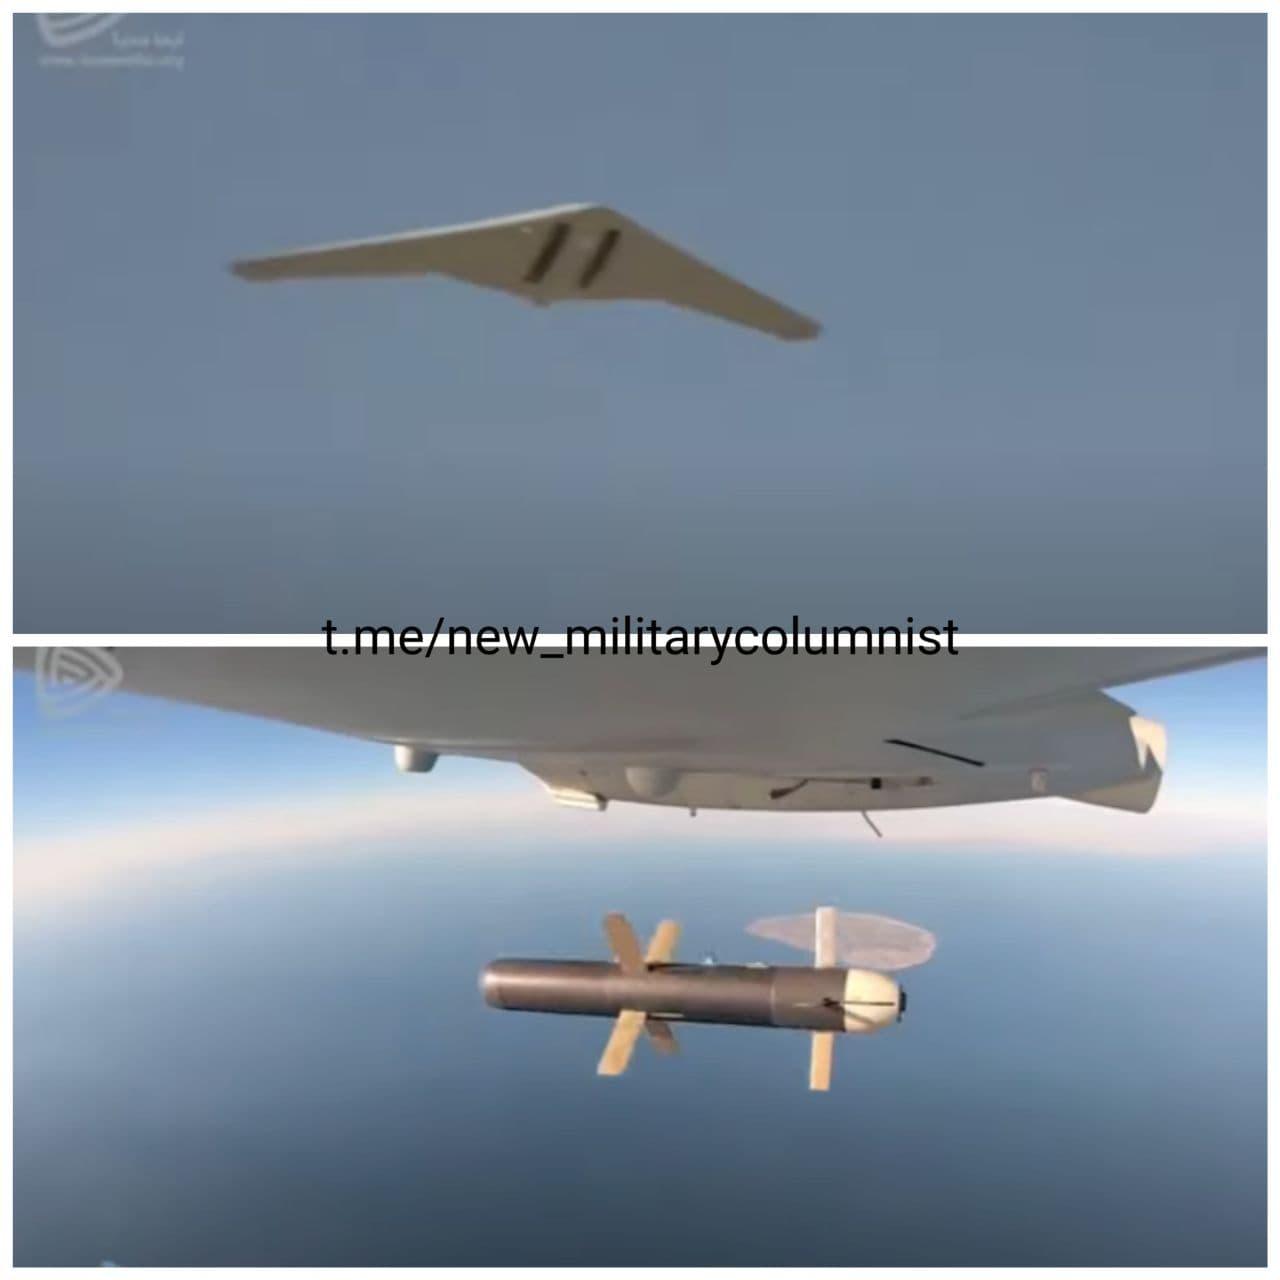 Iran's indigenous UAVs - Page 3 Em5am_nVgAI1025?format=jpg&name=large